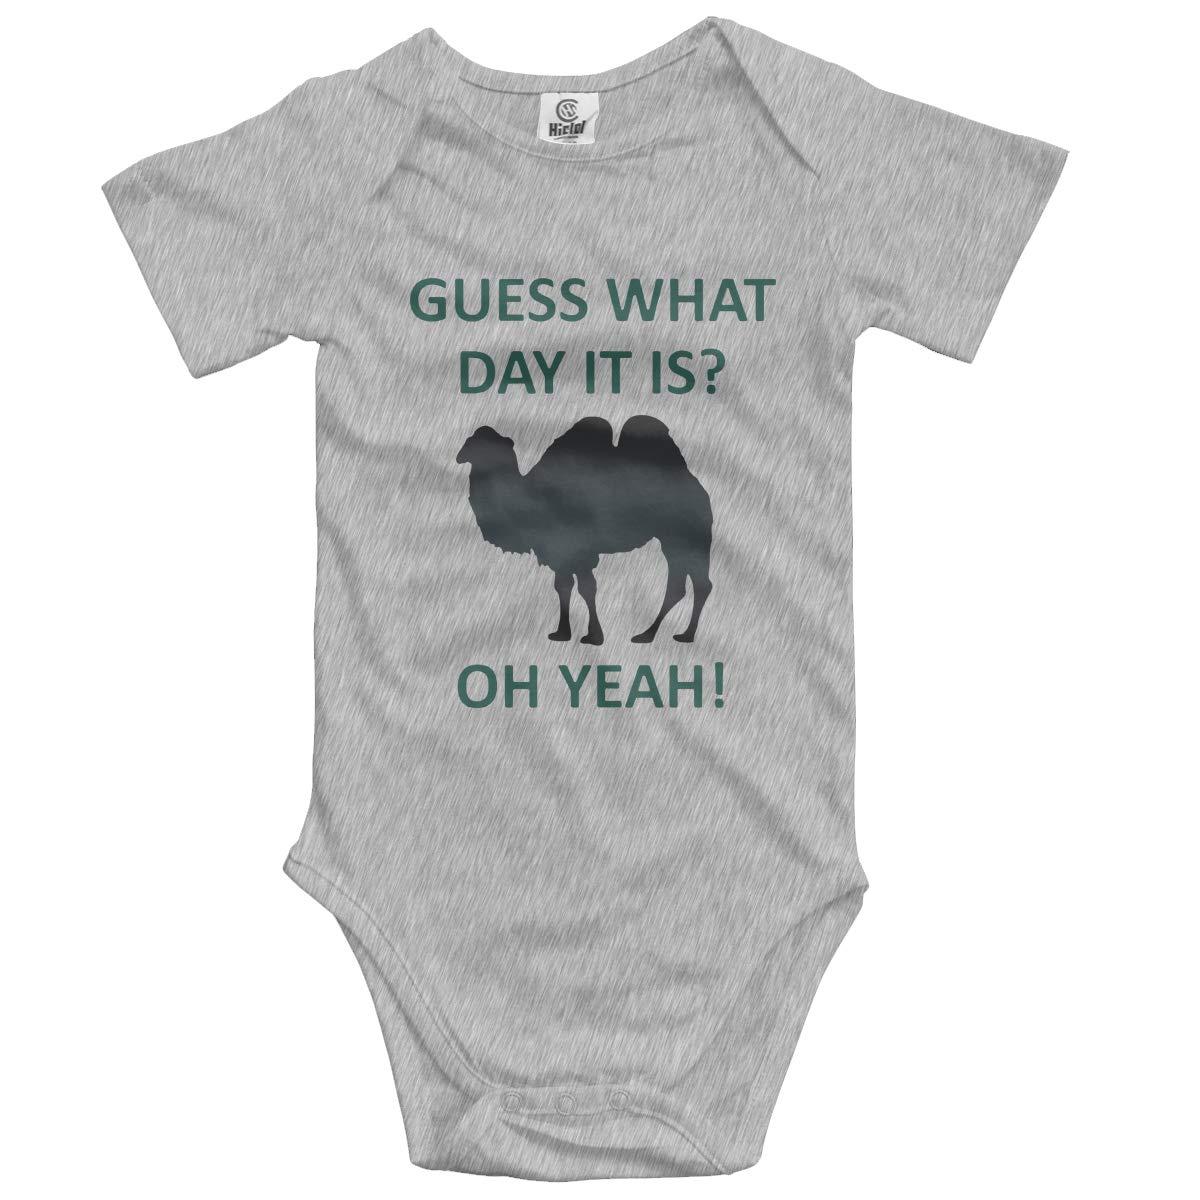 OLPAE Funny Camel Newborn Baby Short Sleeve Onesies Cute Onesies for 0-24 Months Baby